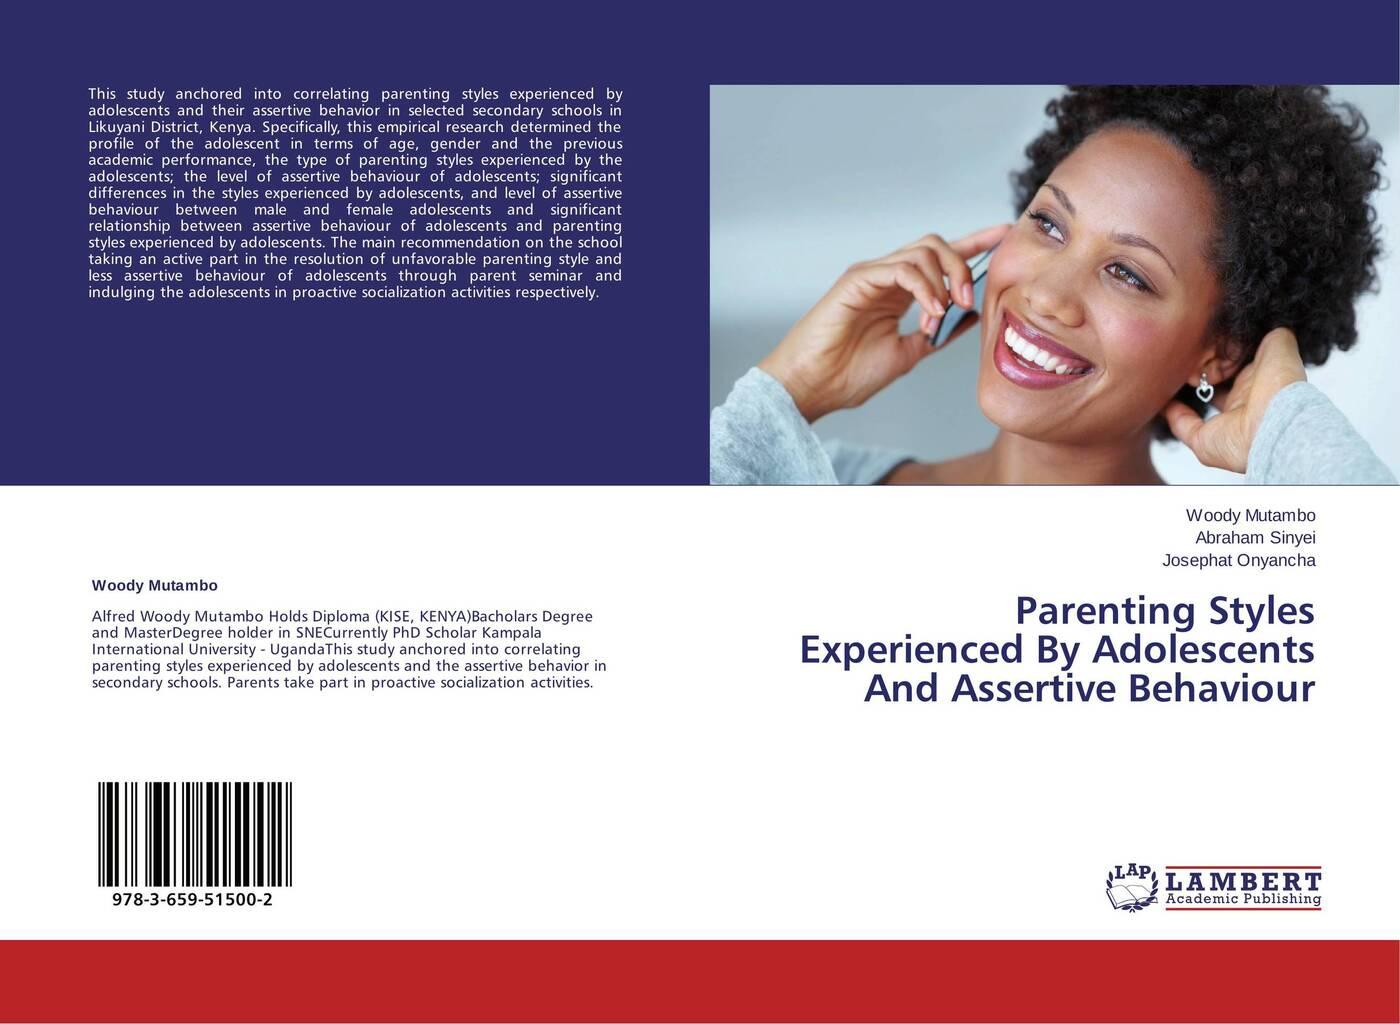 лучшая цена Woody Mutambo,Abraham Sinyei and Josephat Onyancha Parenting Styles Experienced By Adolescents And Assertive Behaviour